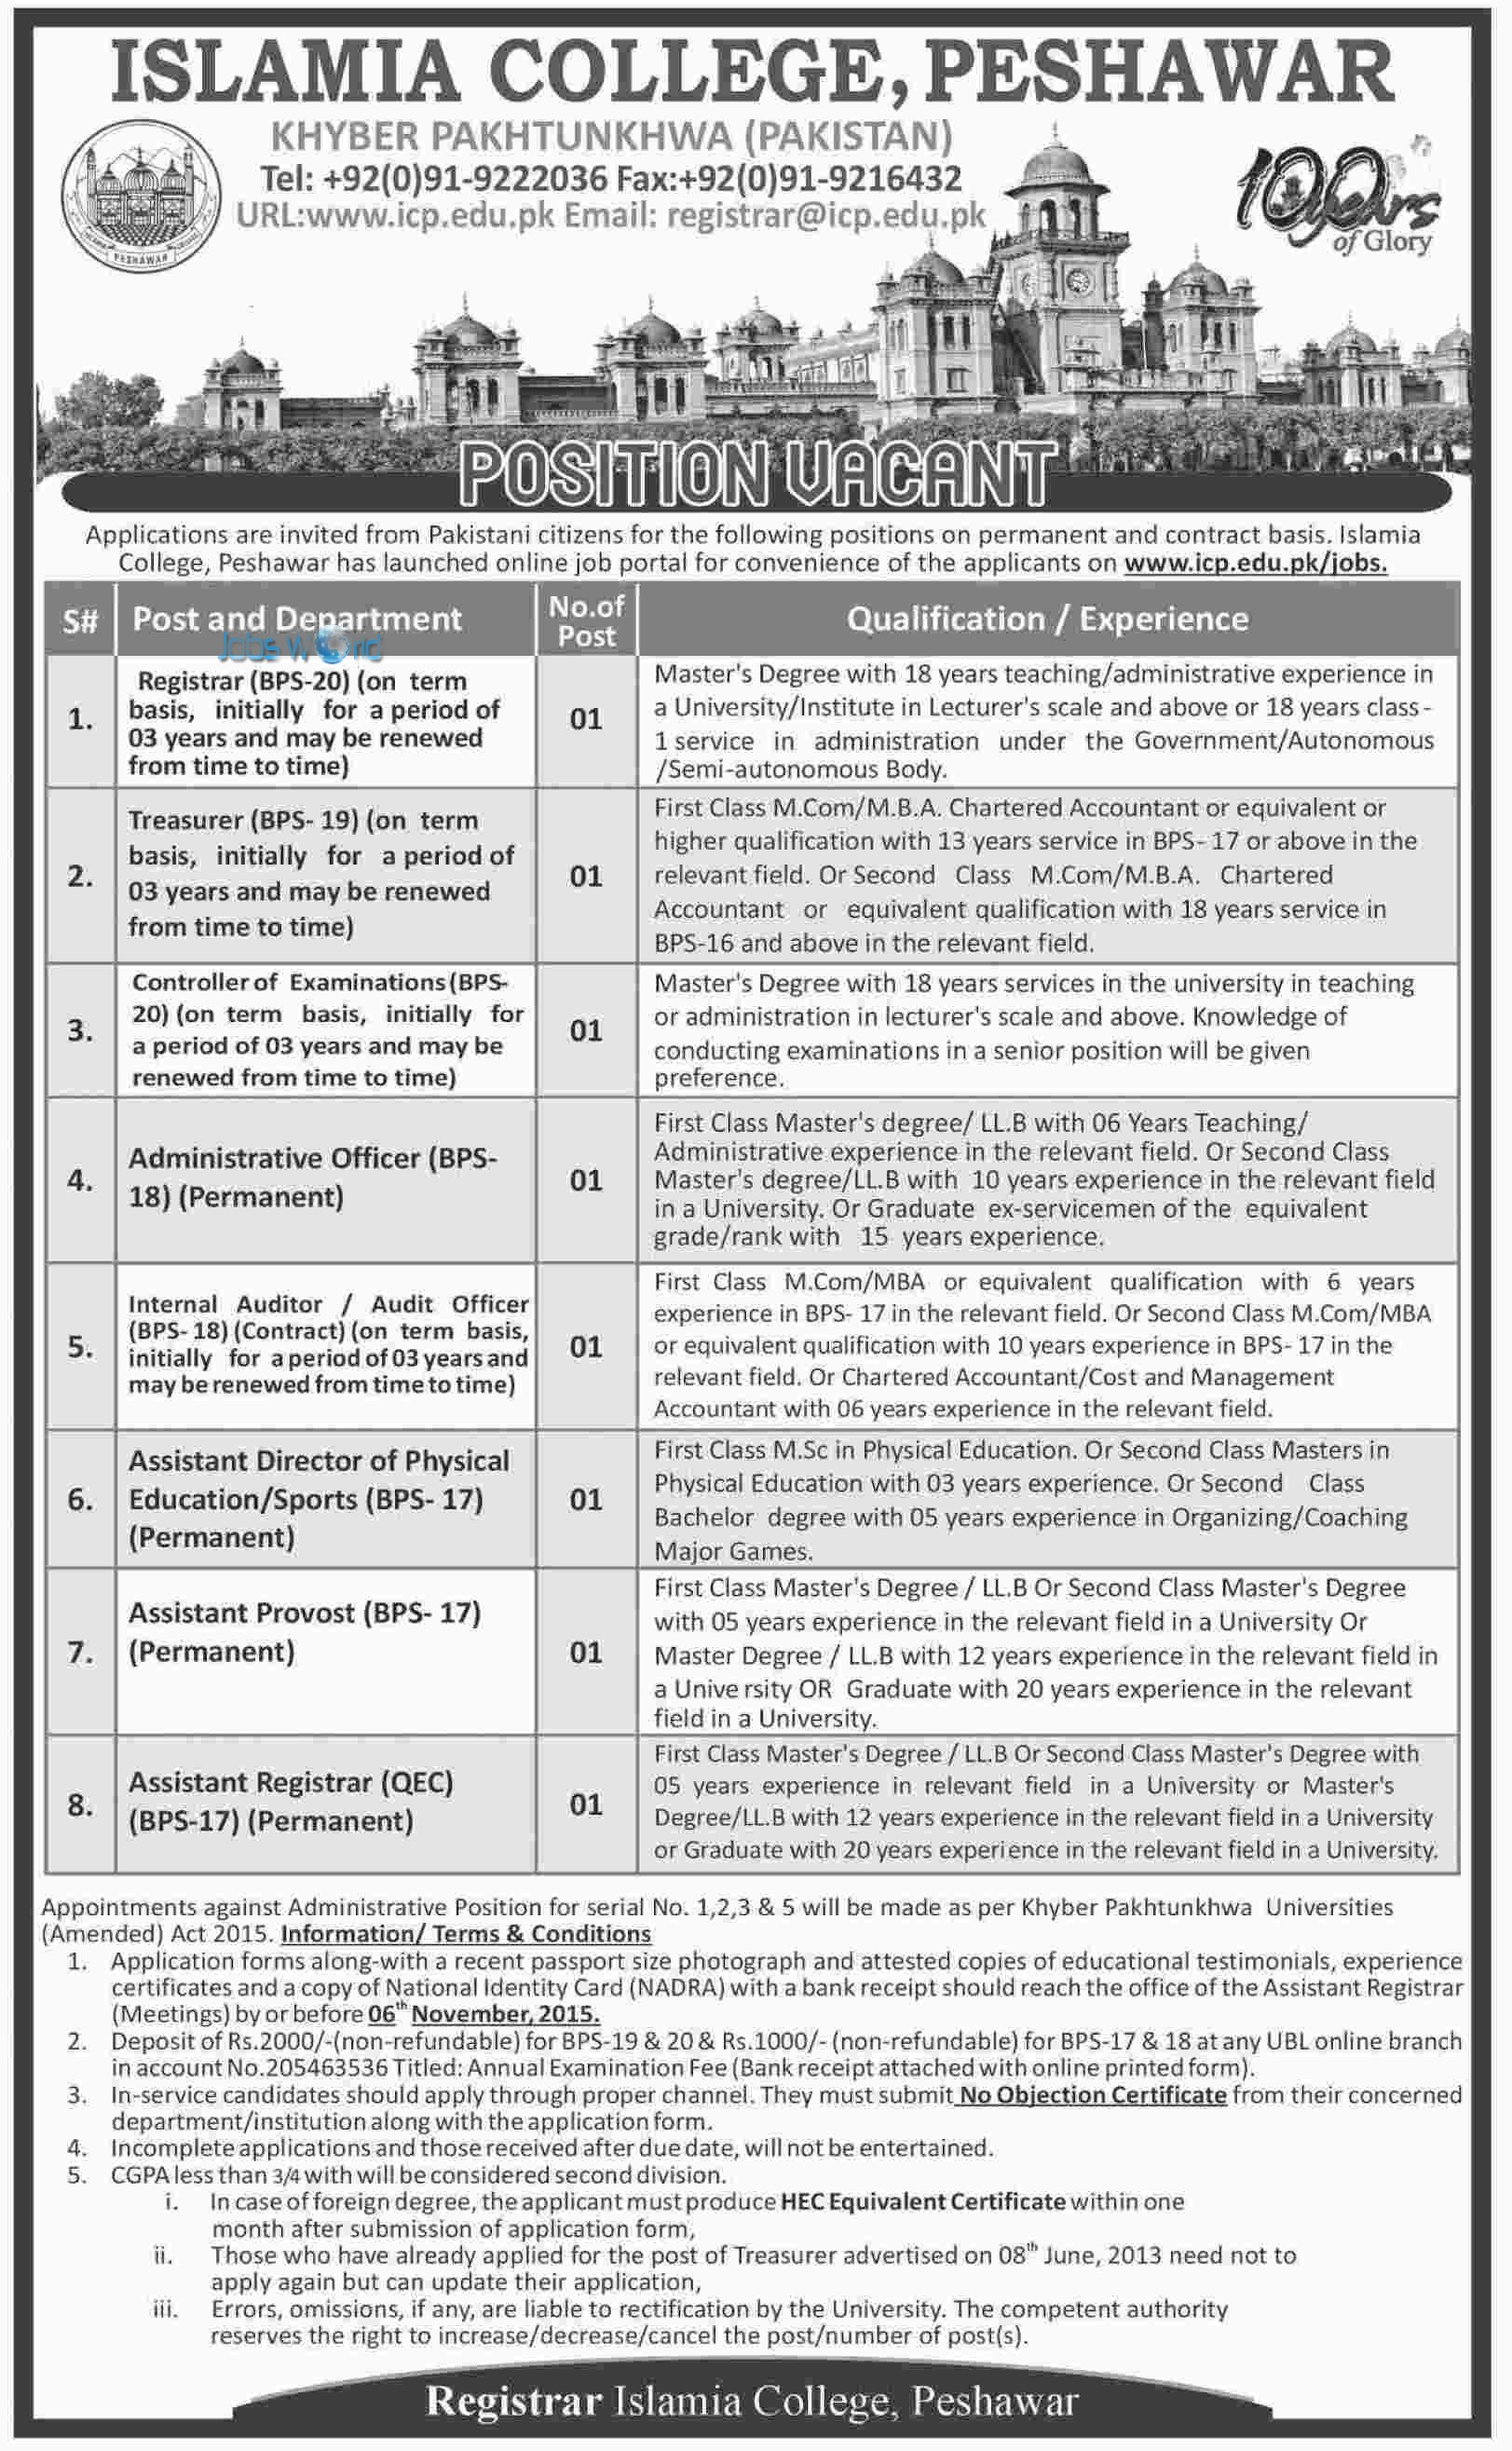 Islamia College Peshawar KPK Jobs Opportunity Latest Posts JobsWorld